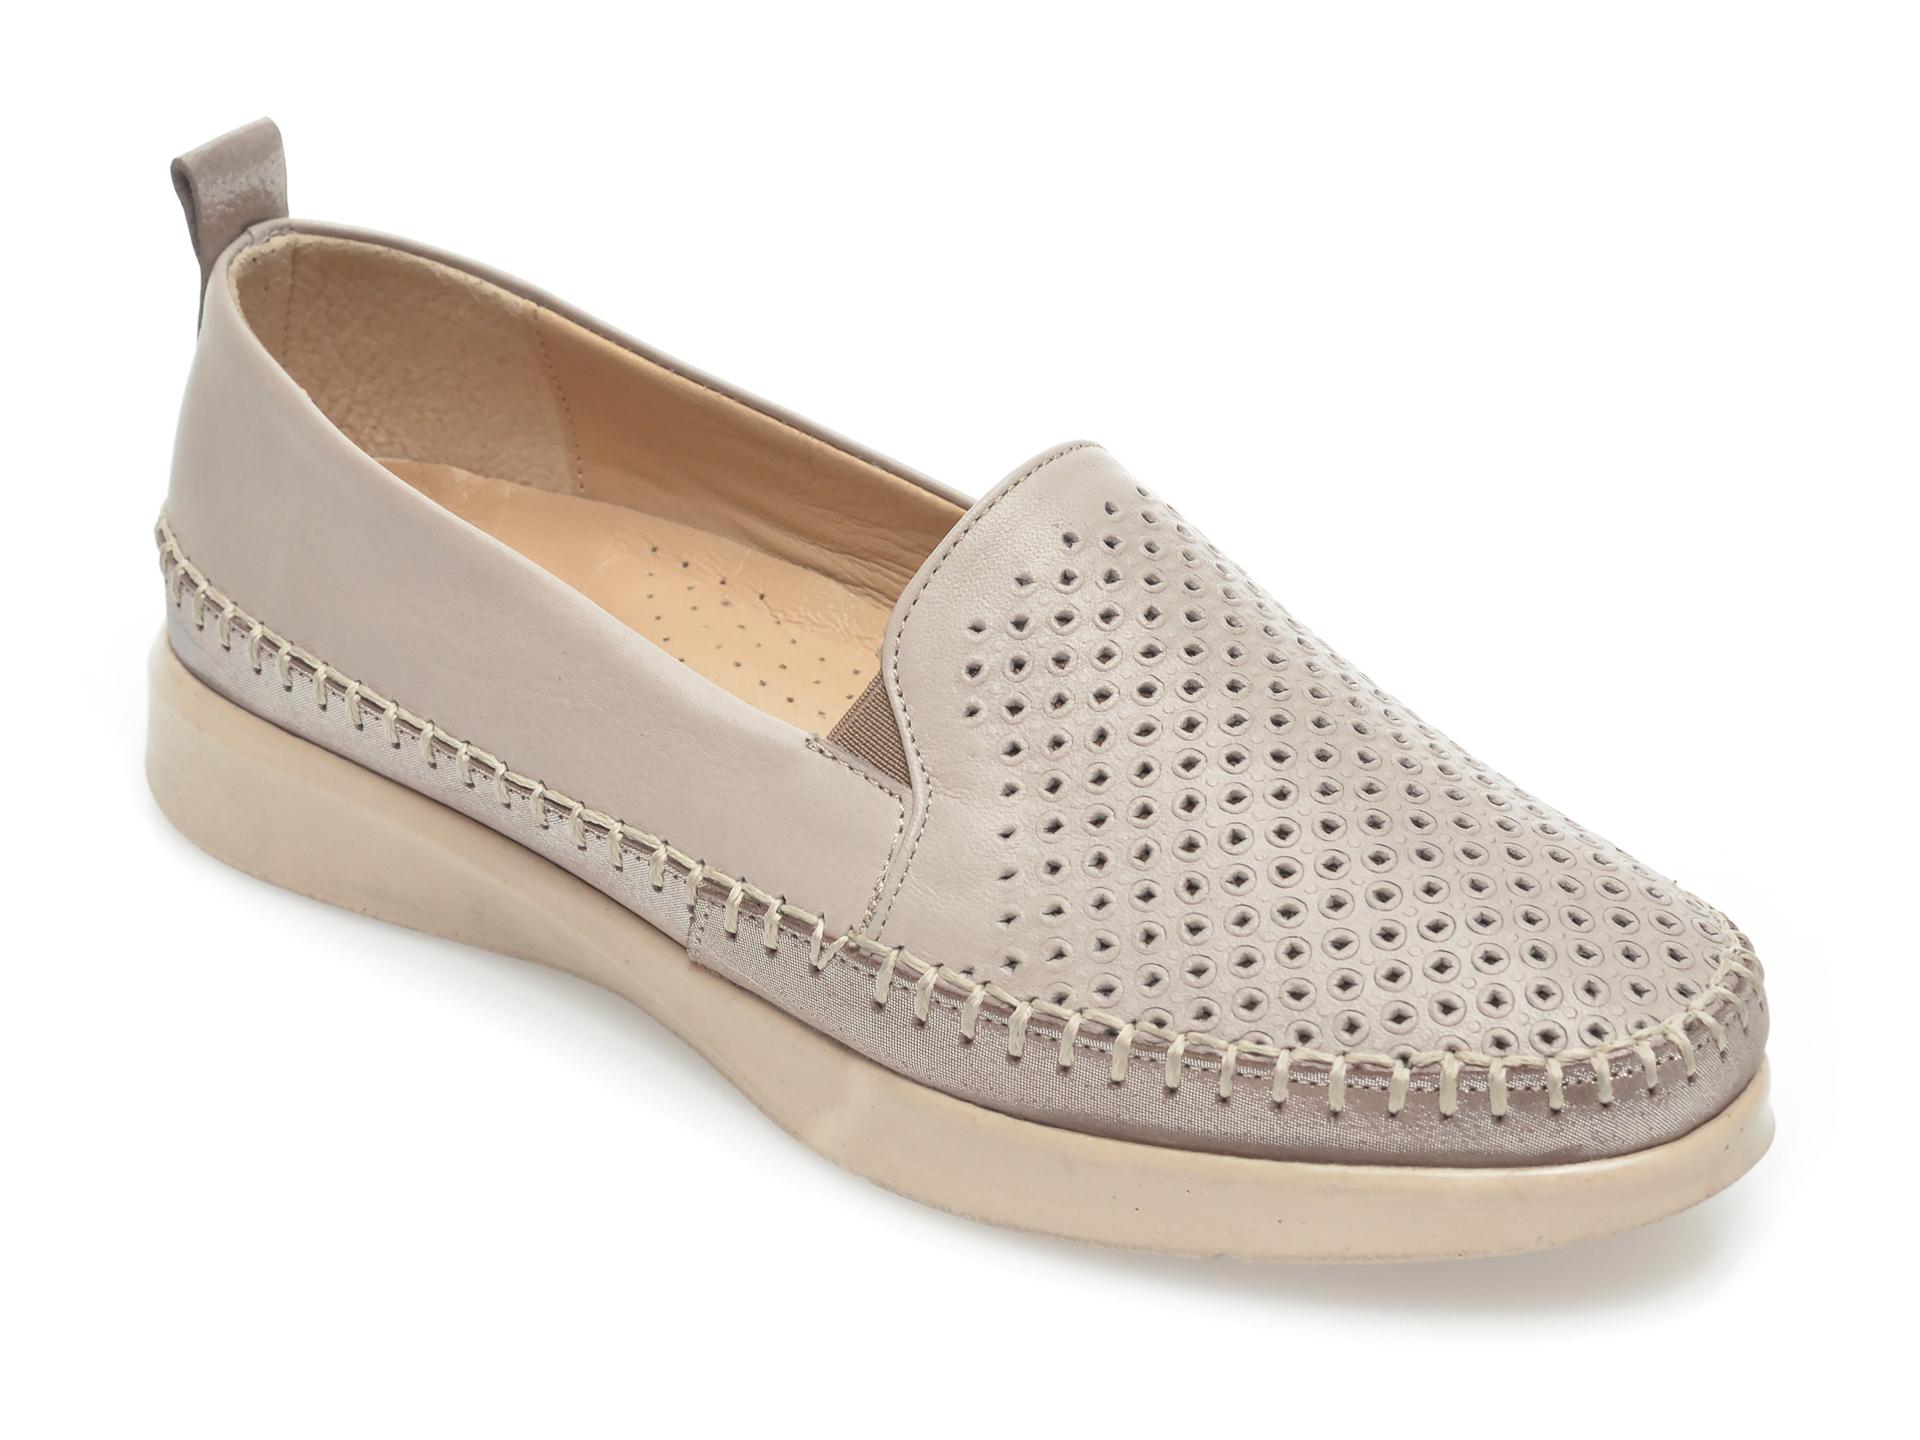 Pantofi FLAVIA PASSINI gri, 305, din piele naturala imagine otter.ro 2021